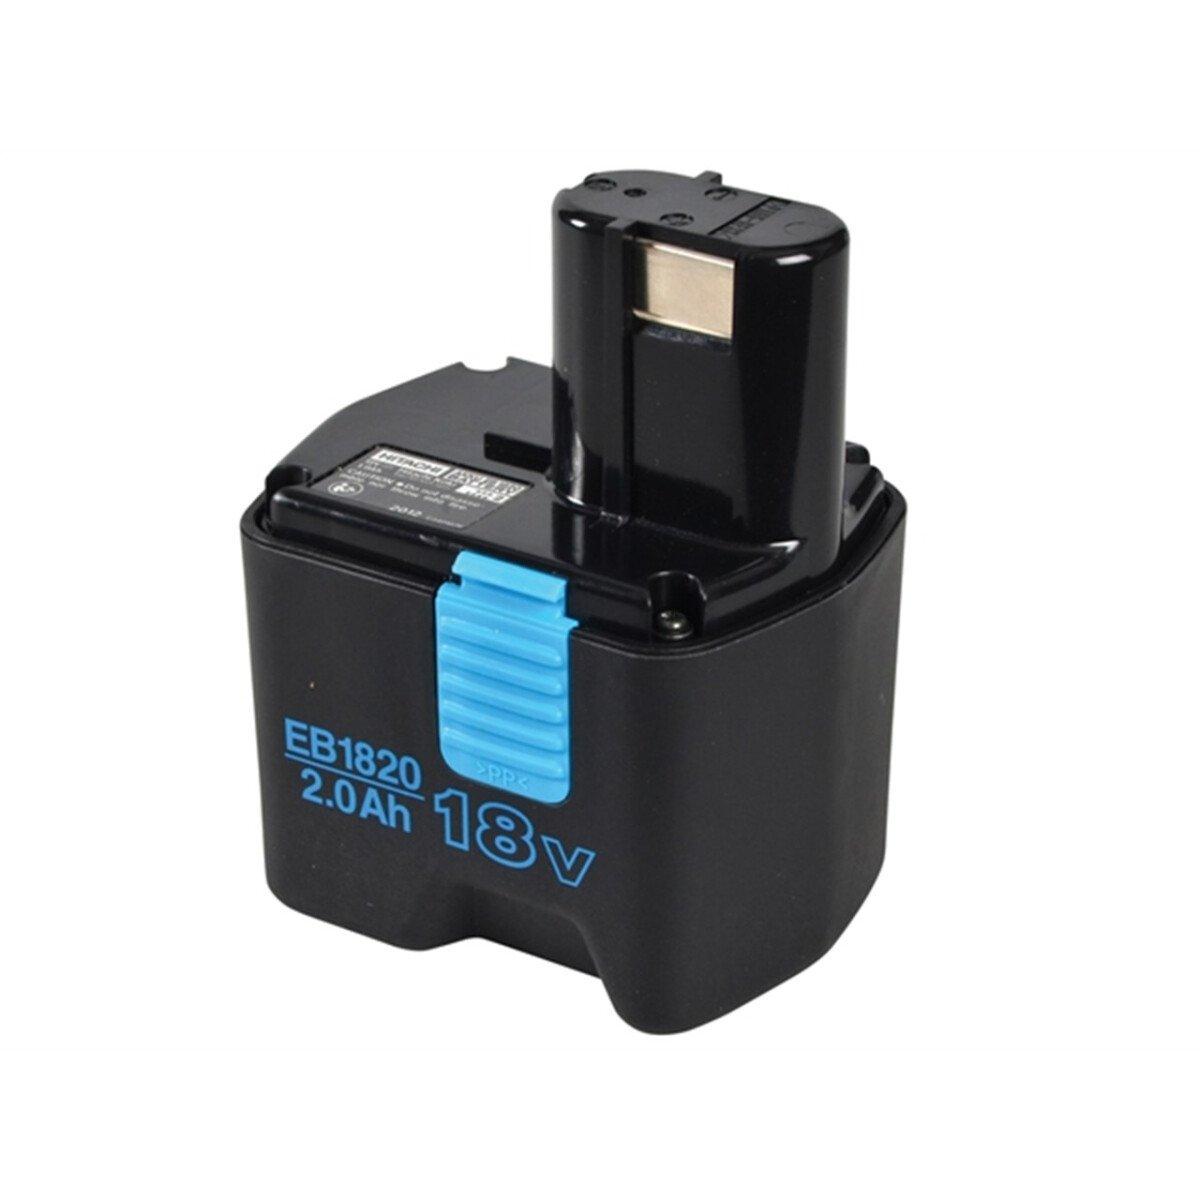 HIKOKI EB1820L 18V Battery  2.0Ah Ni-Cd